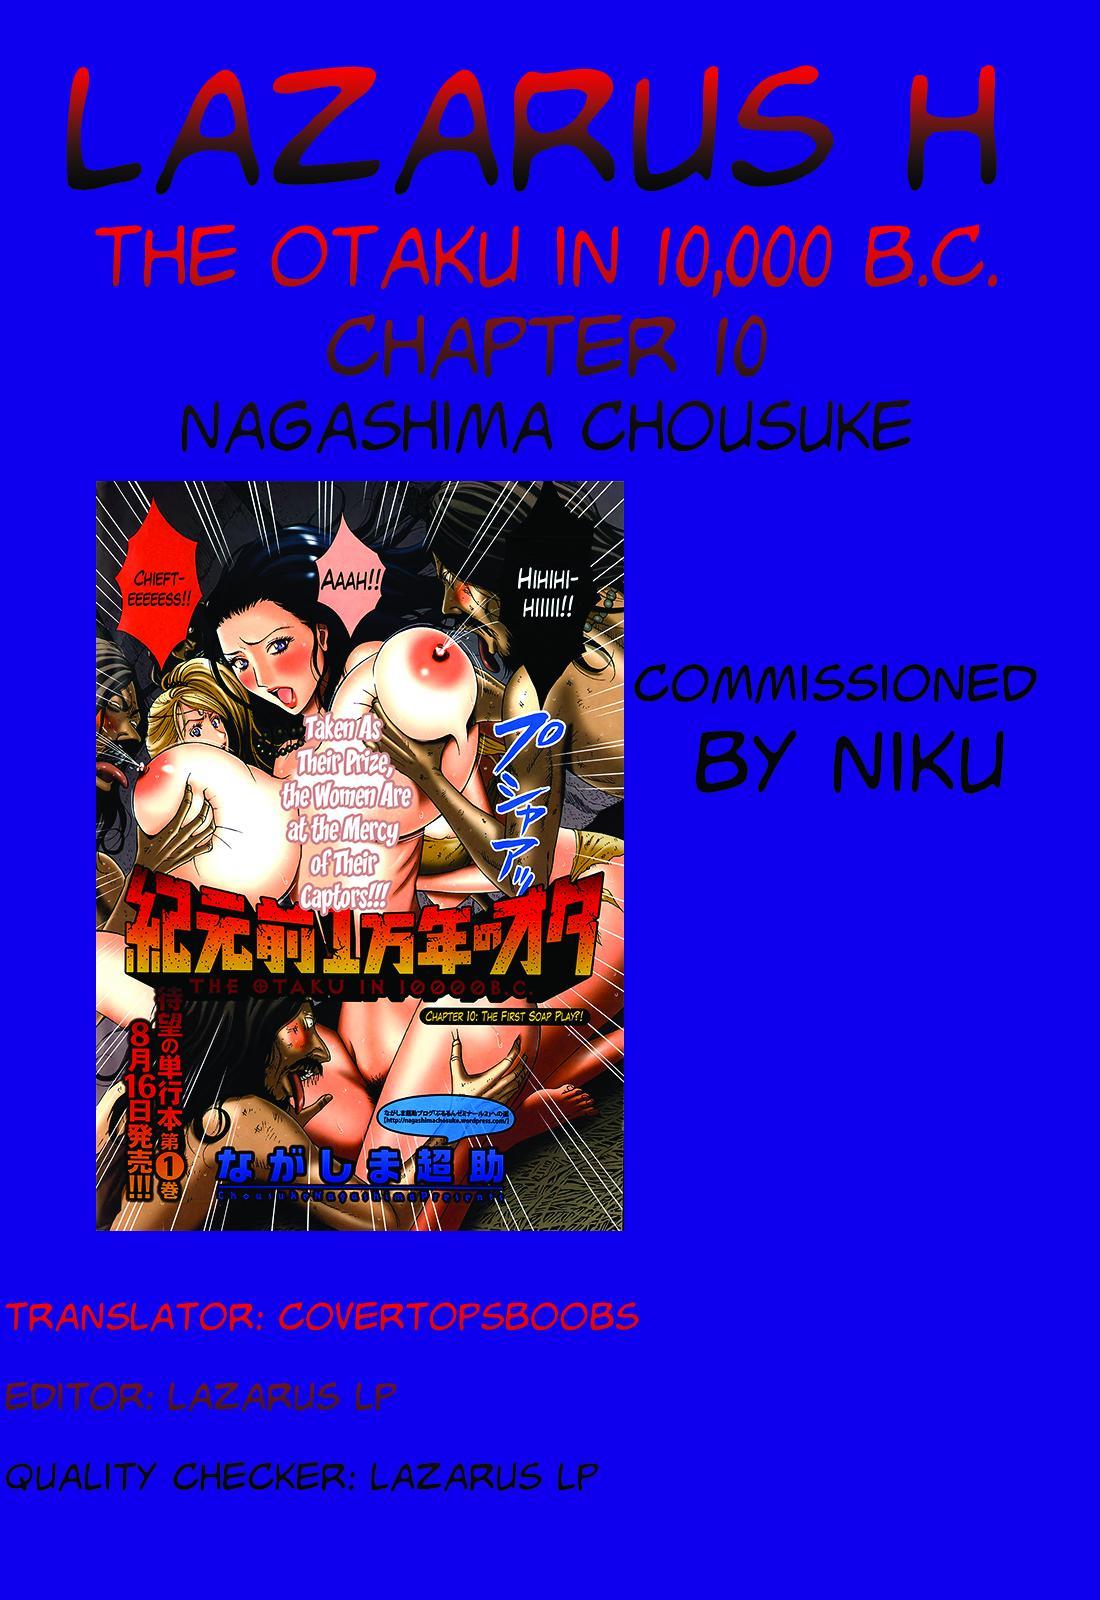 Kigenzen 10000 Nen no Ota   The Otaku in 10,000 B.C. Ch. 1-22 195